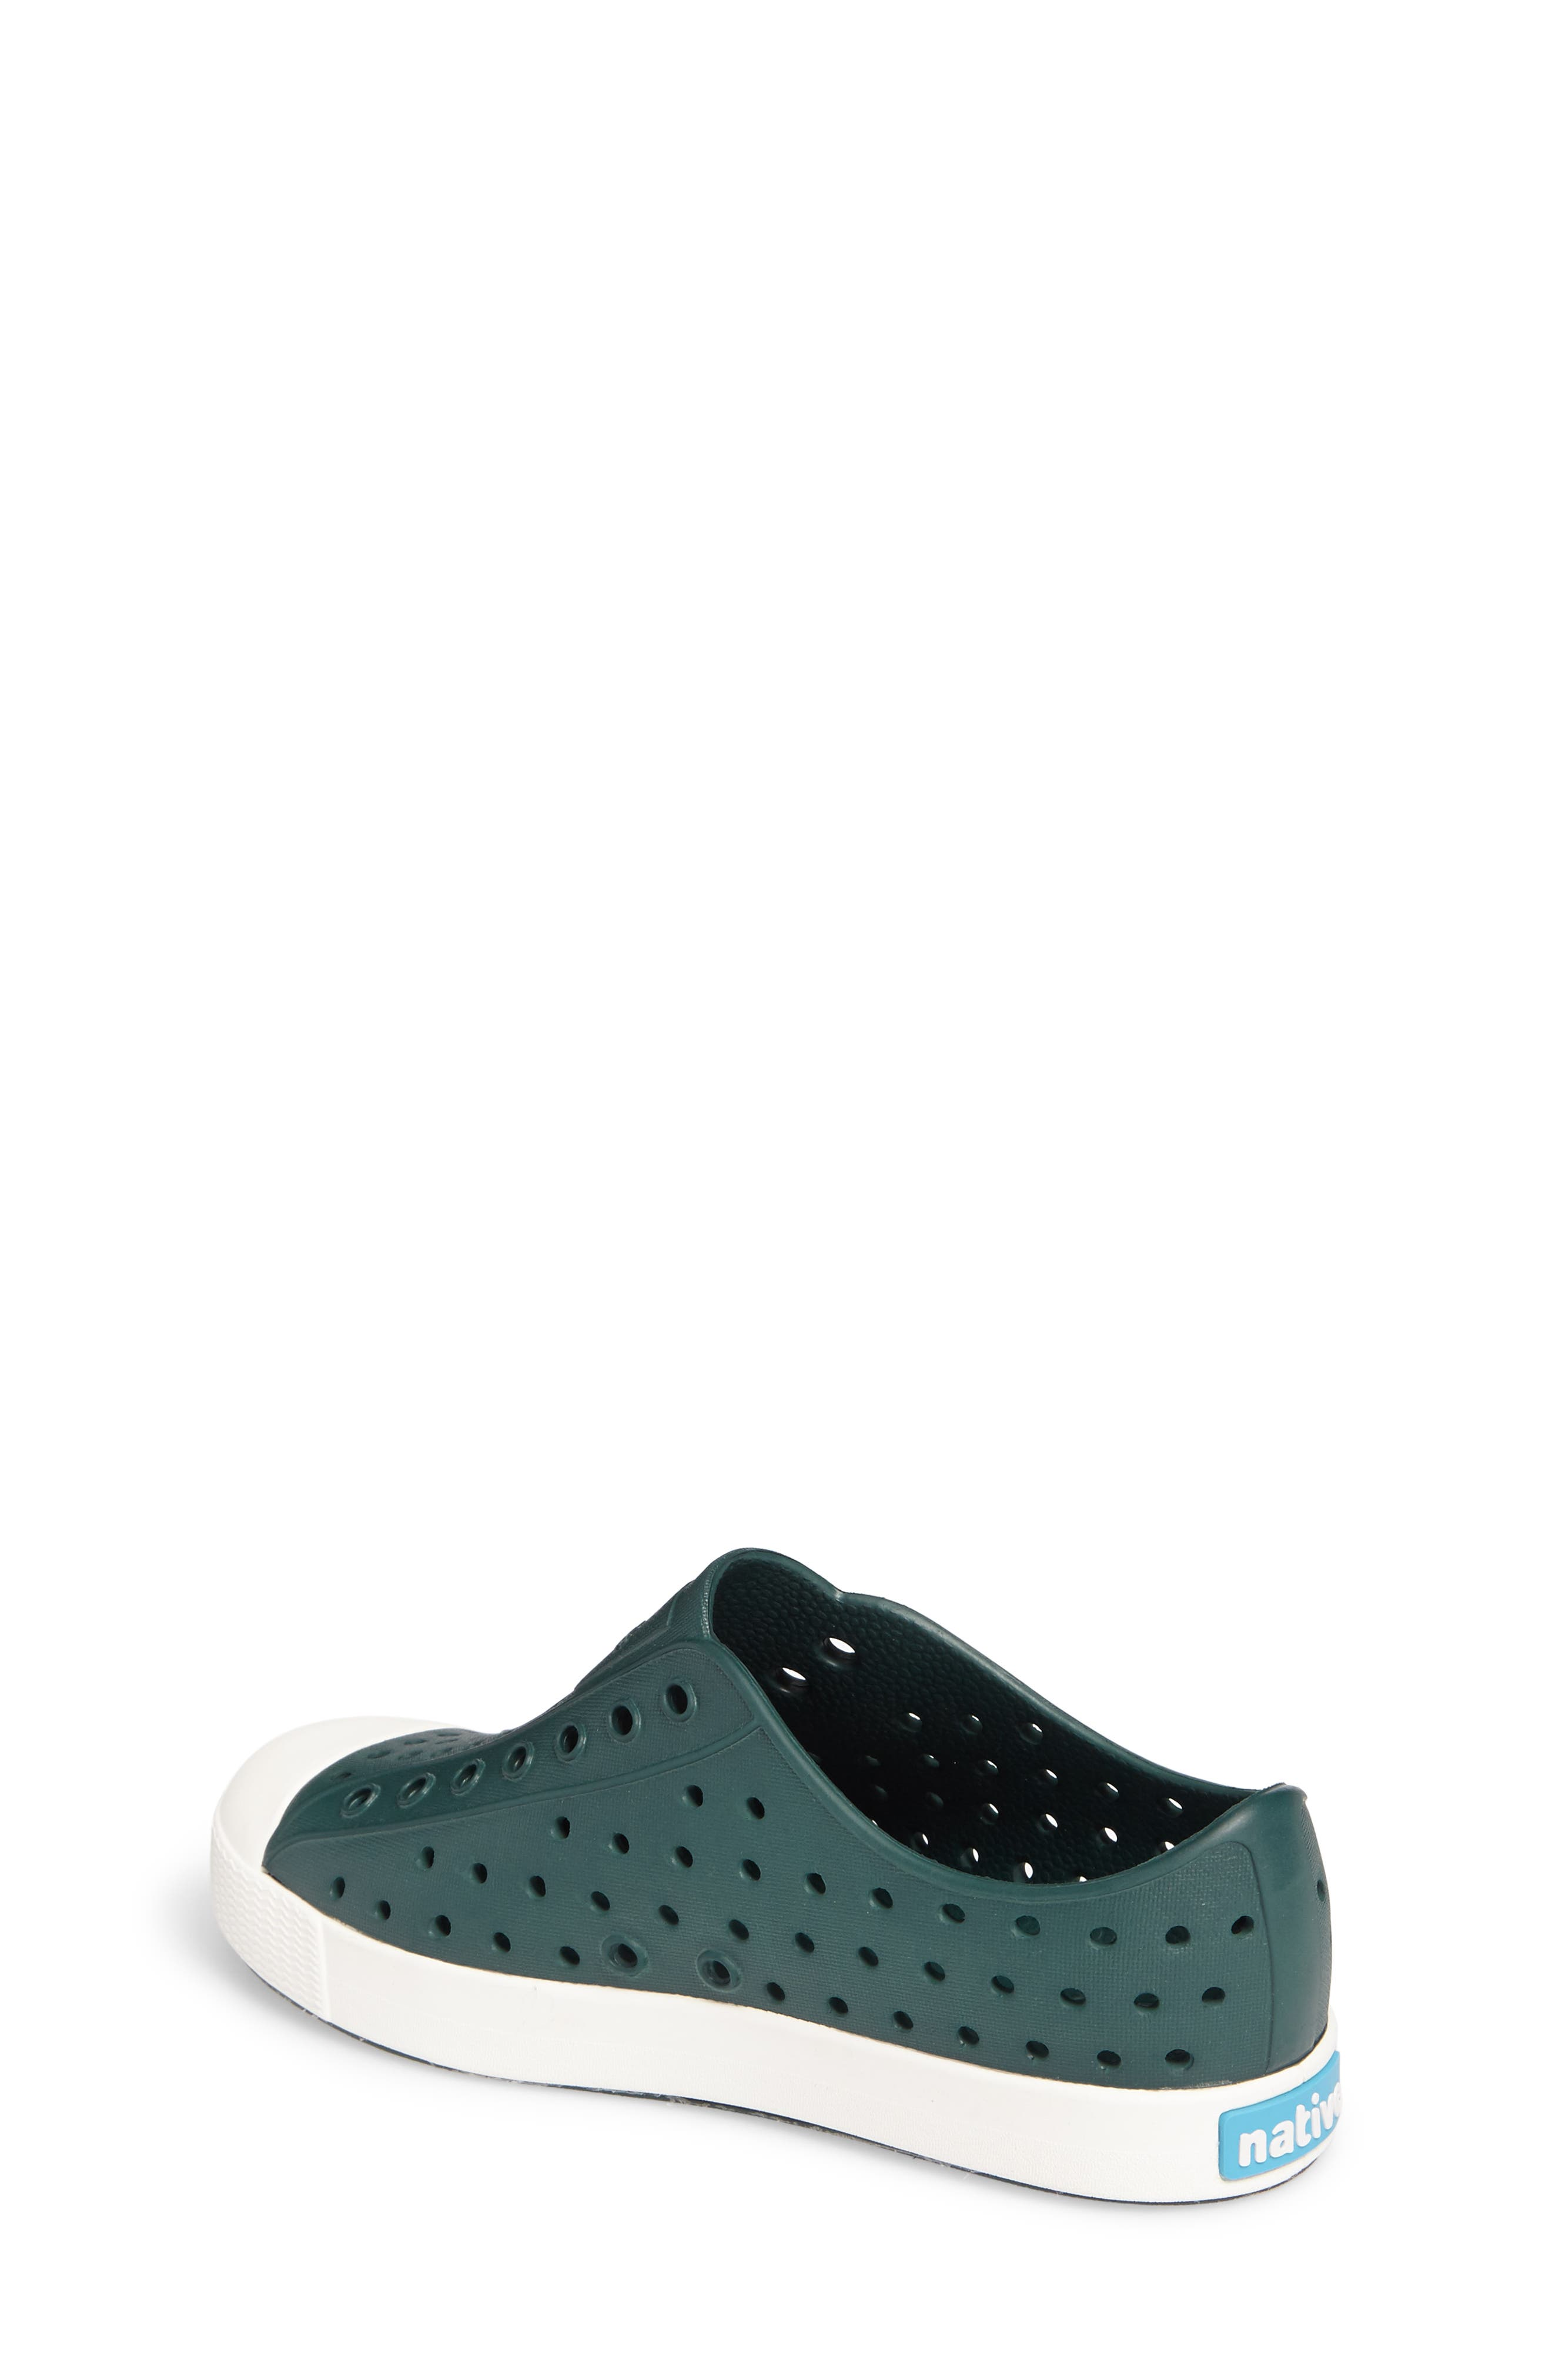 'Jefferson' Water Friendly Slip-On Sneaker,                             Alternate thumbnail 89, color,